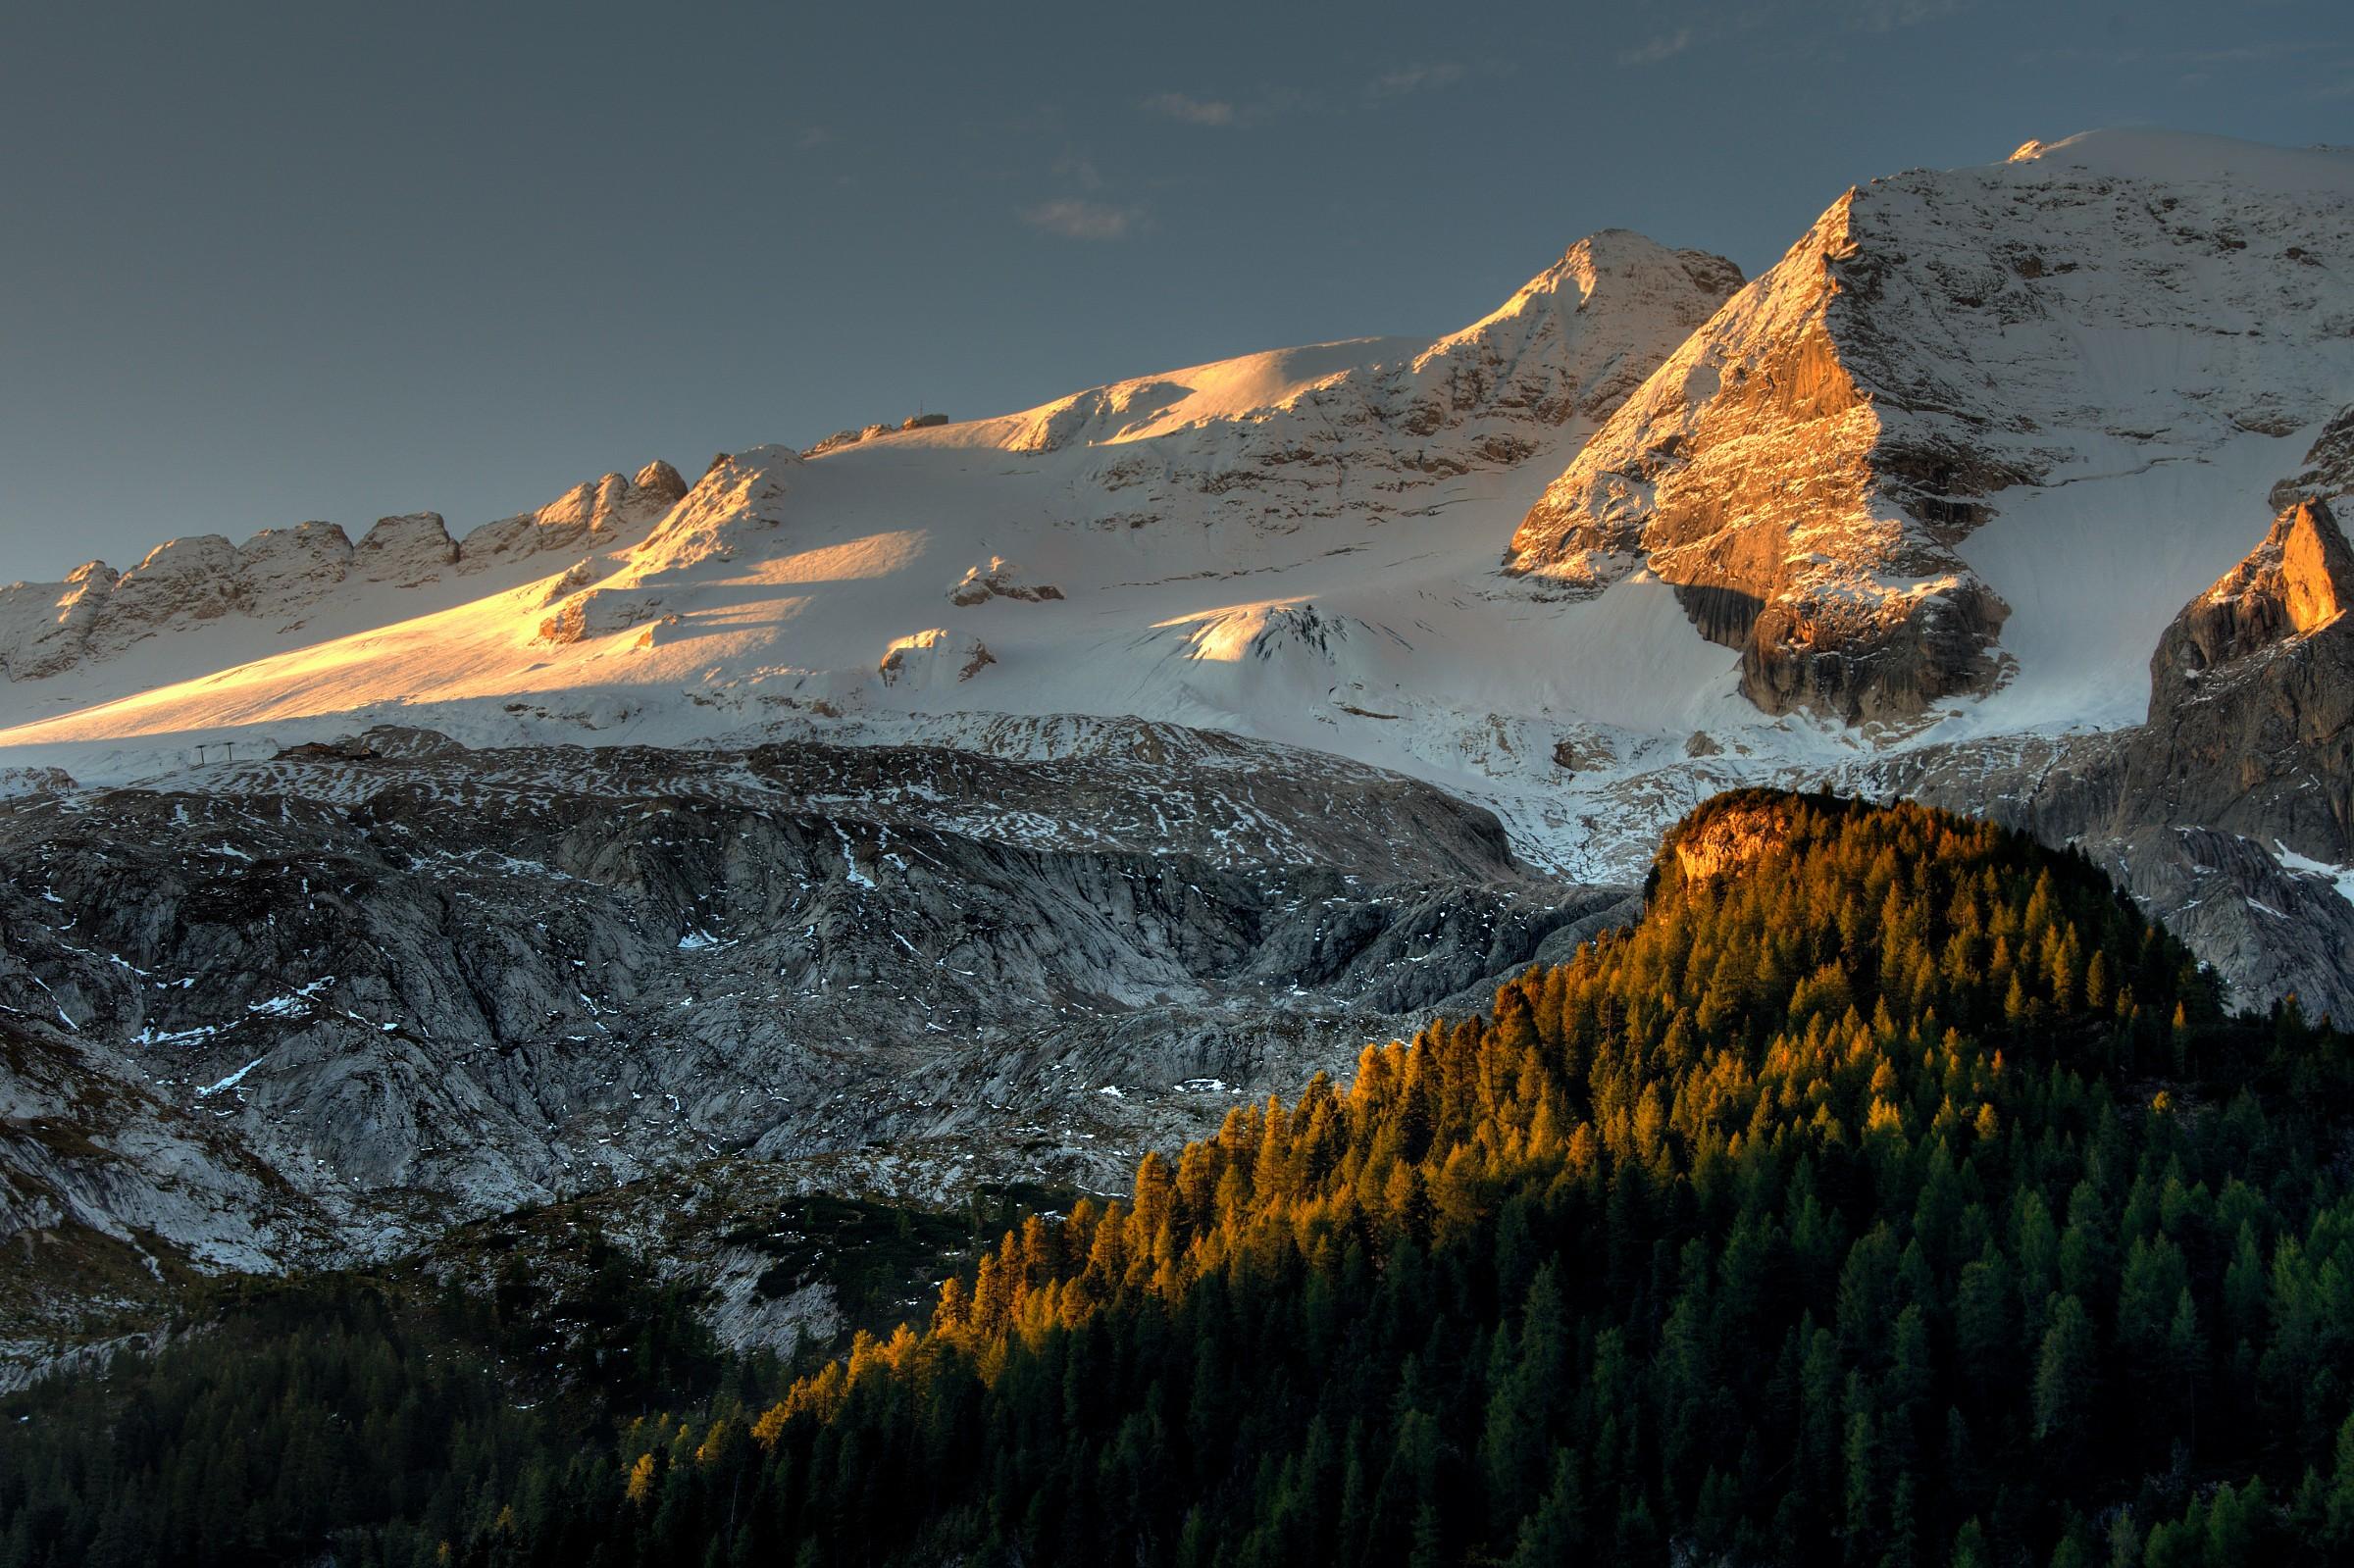 Sunrise on the Marmolada...